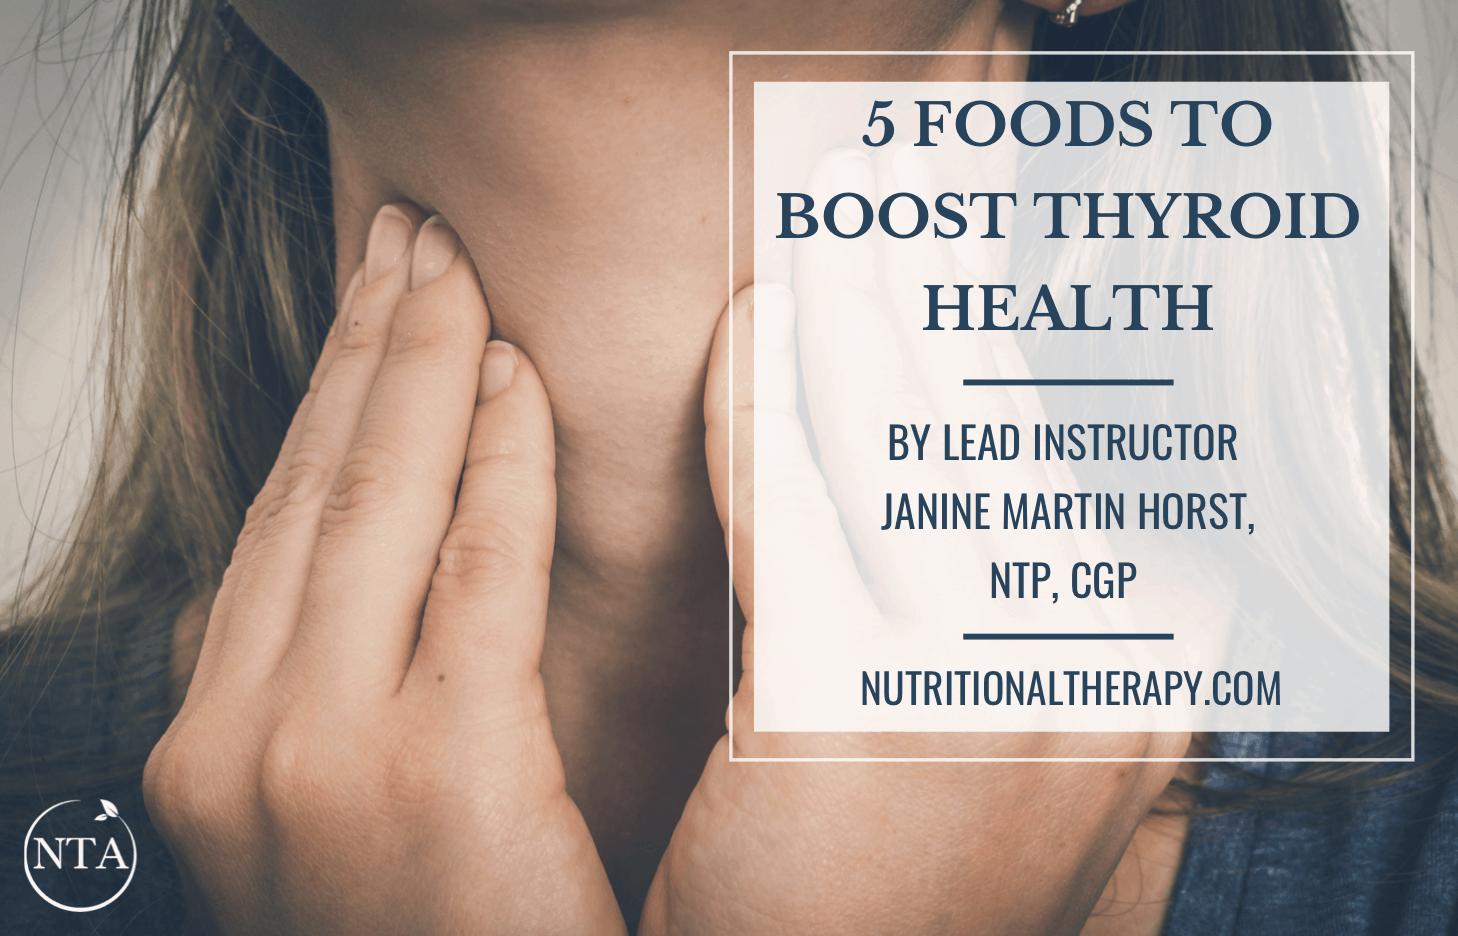 5 Foods For Thyroid Health